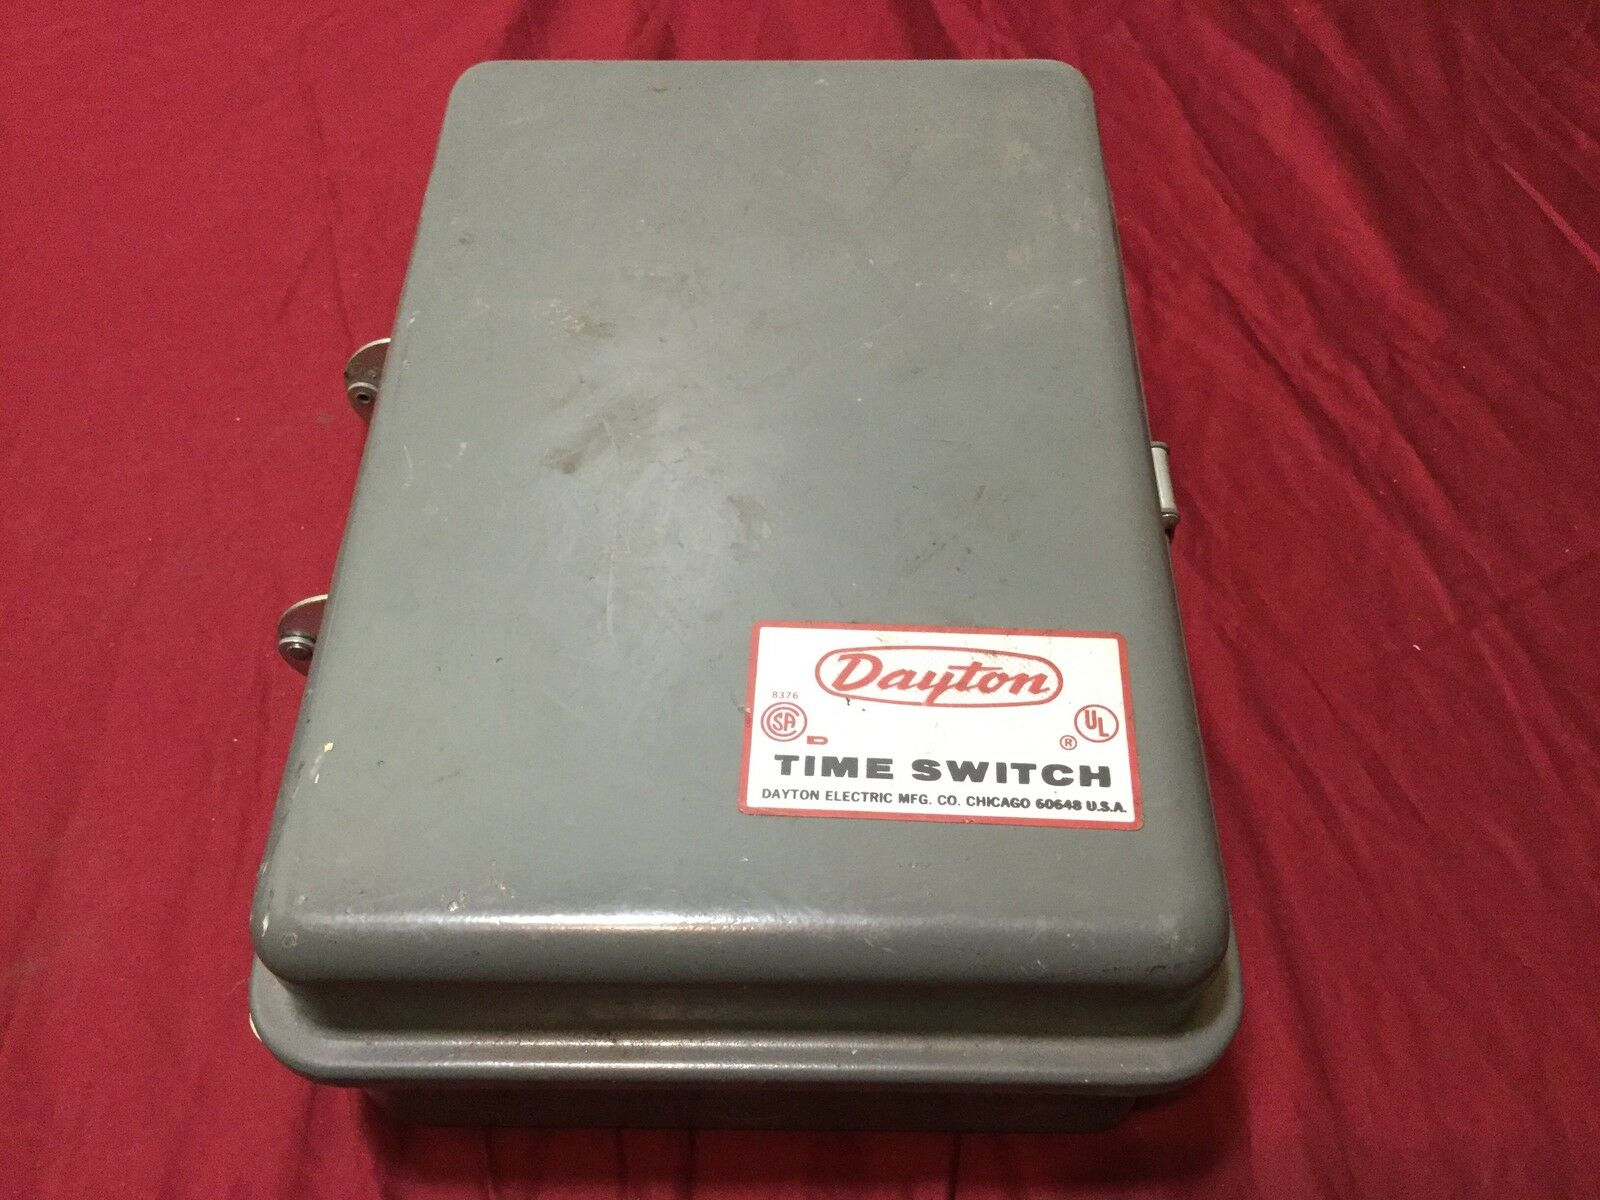 Dayton Sevenday Time Switch Timer